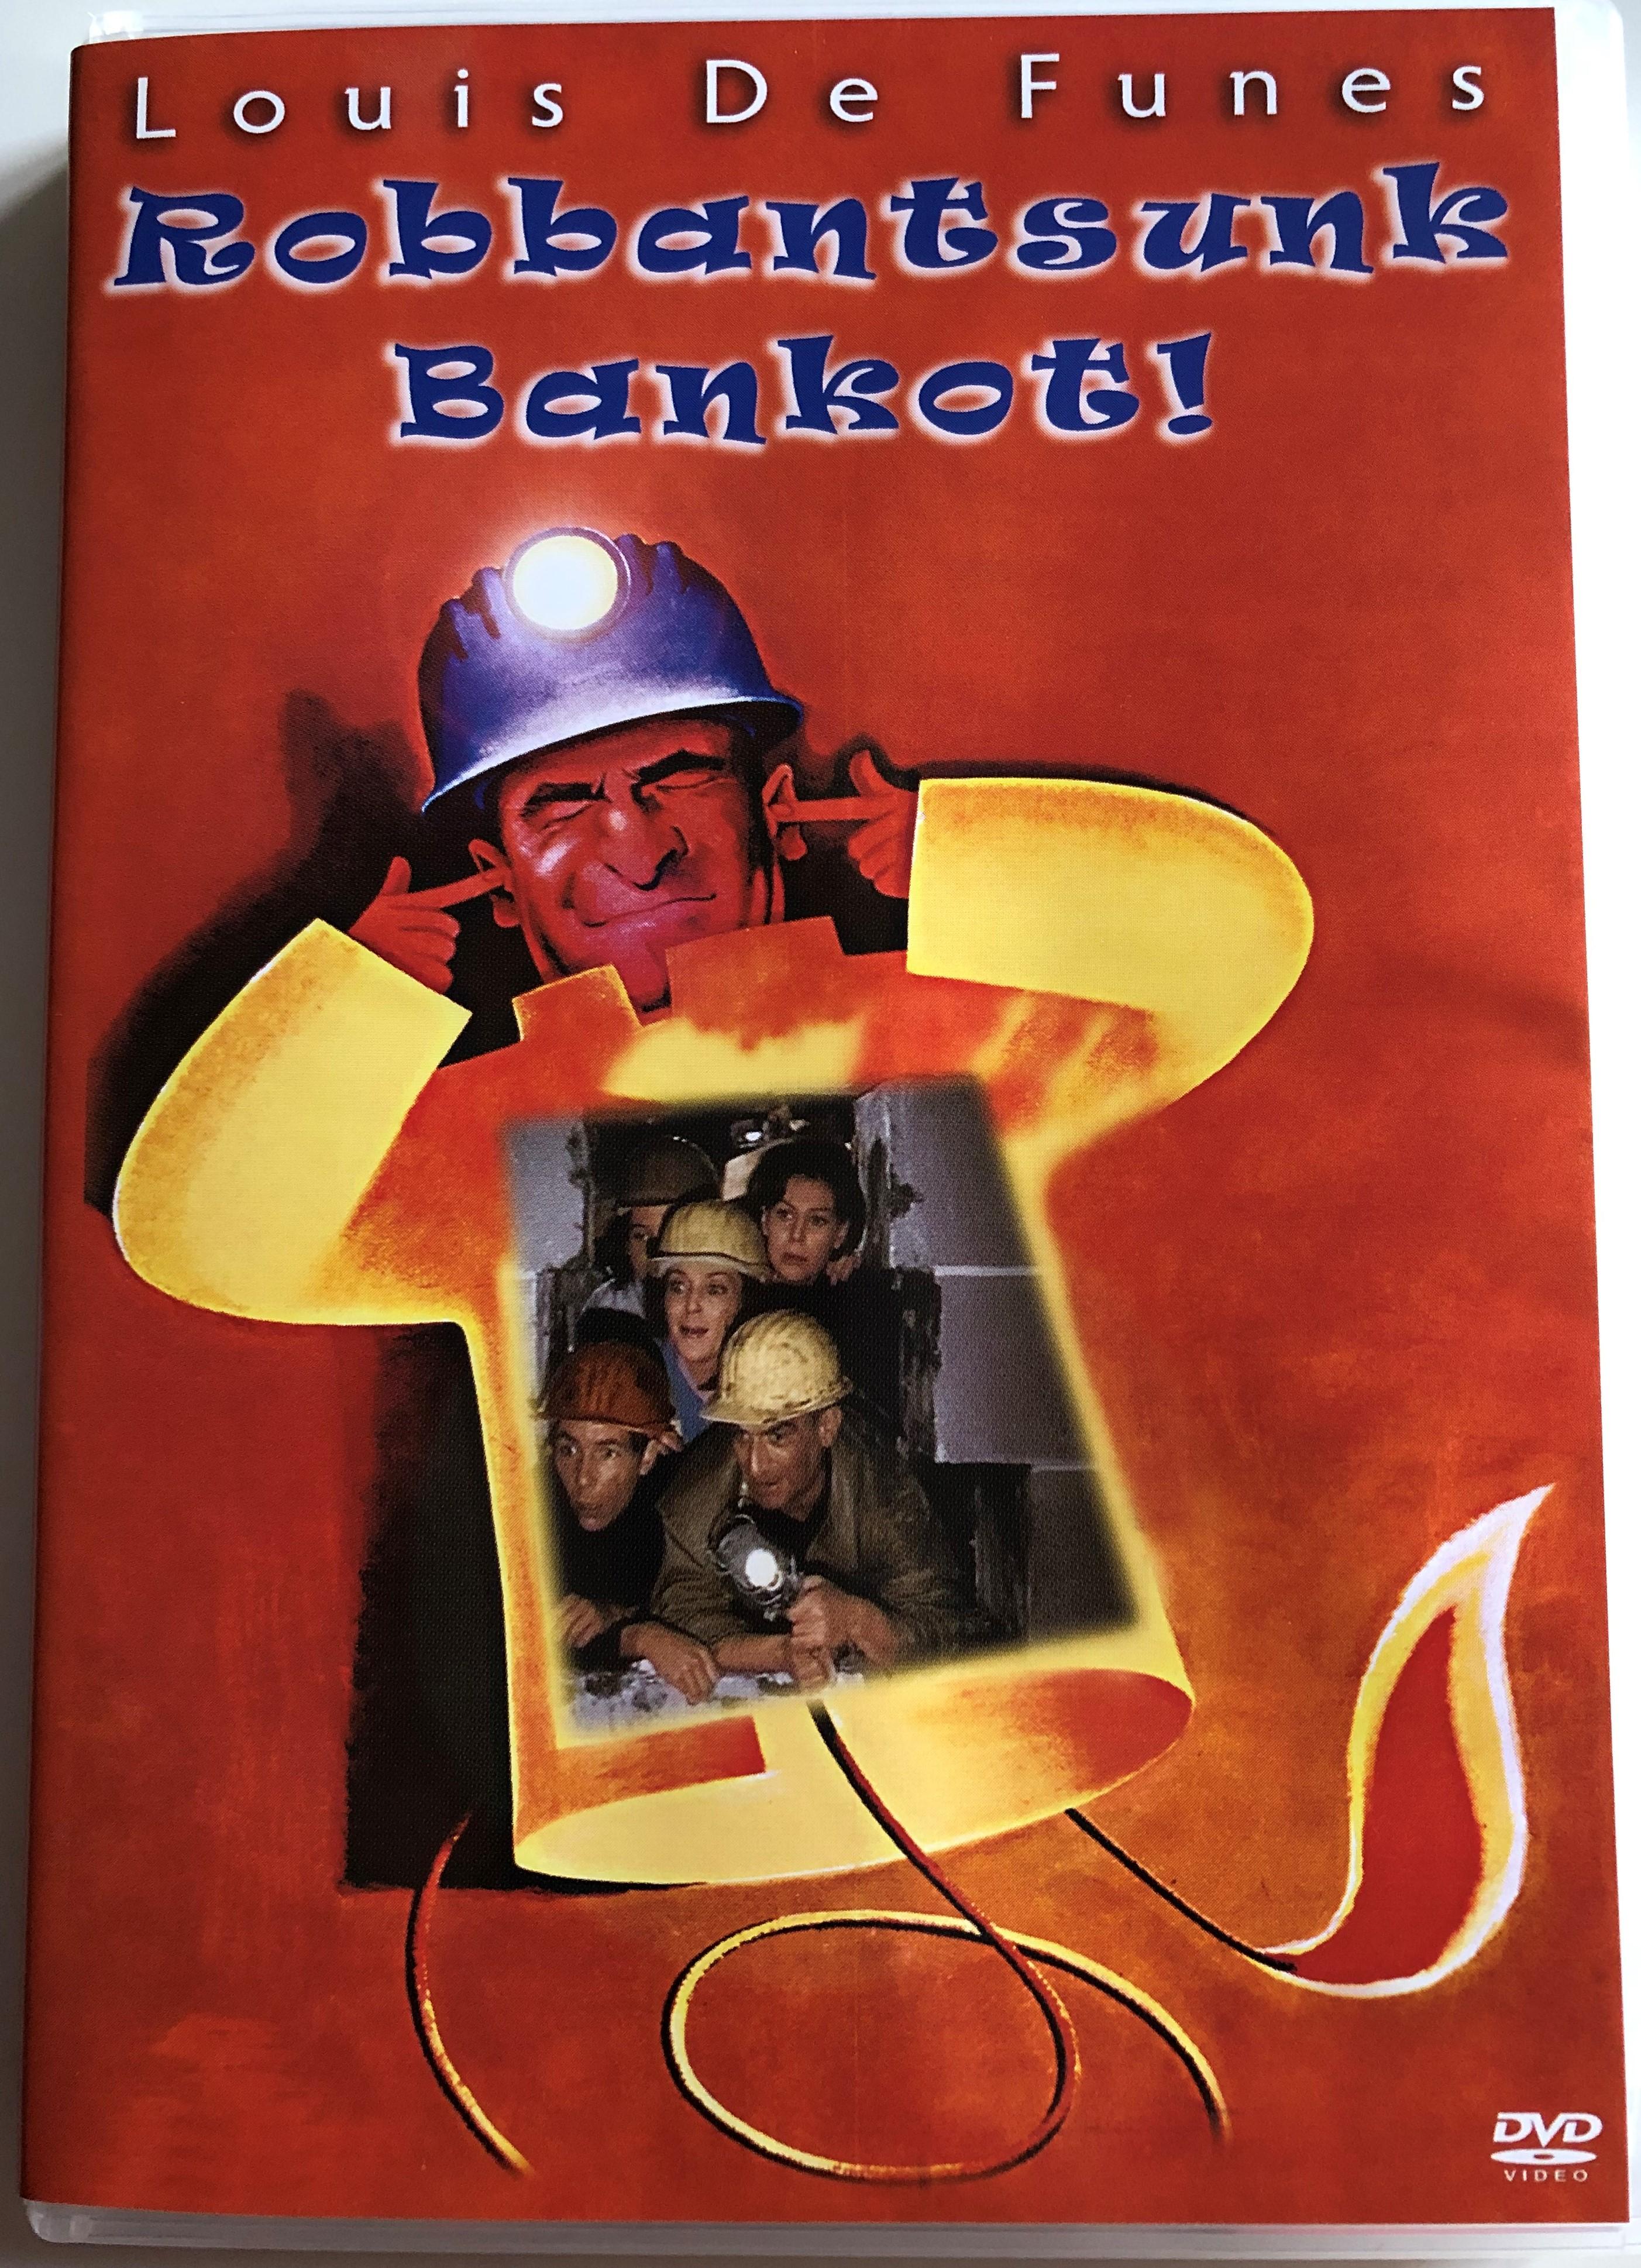 Faites Sauter La Banque ! : faites, sauter, banque, Faites, Sauter, Banque!, Robbantsunk, Bankot!, (Let's, Bank), Directed, Girault, Starring:, Louis, Funès,, Jean-Pierre, Marielle,, Yvonne, Clech, Bibleinmylanguage